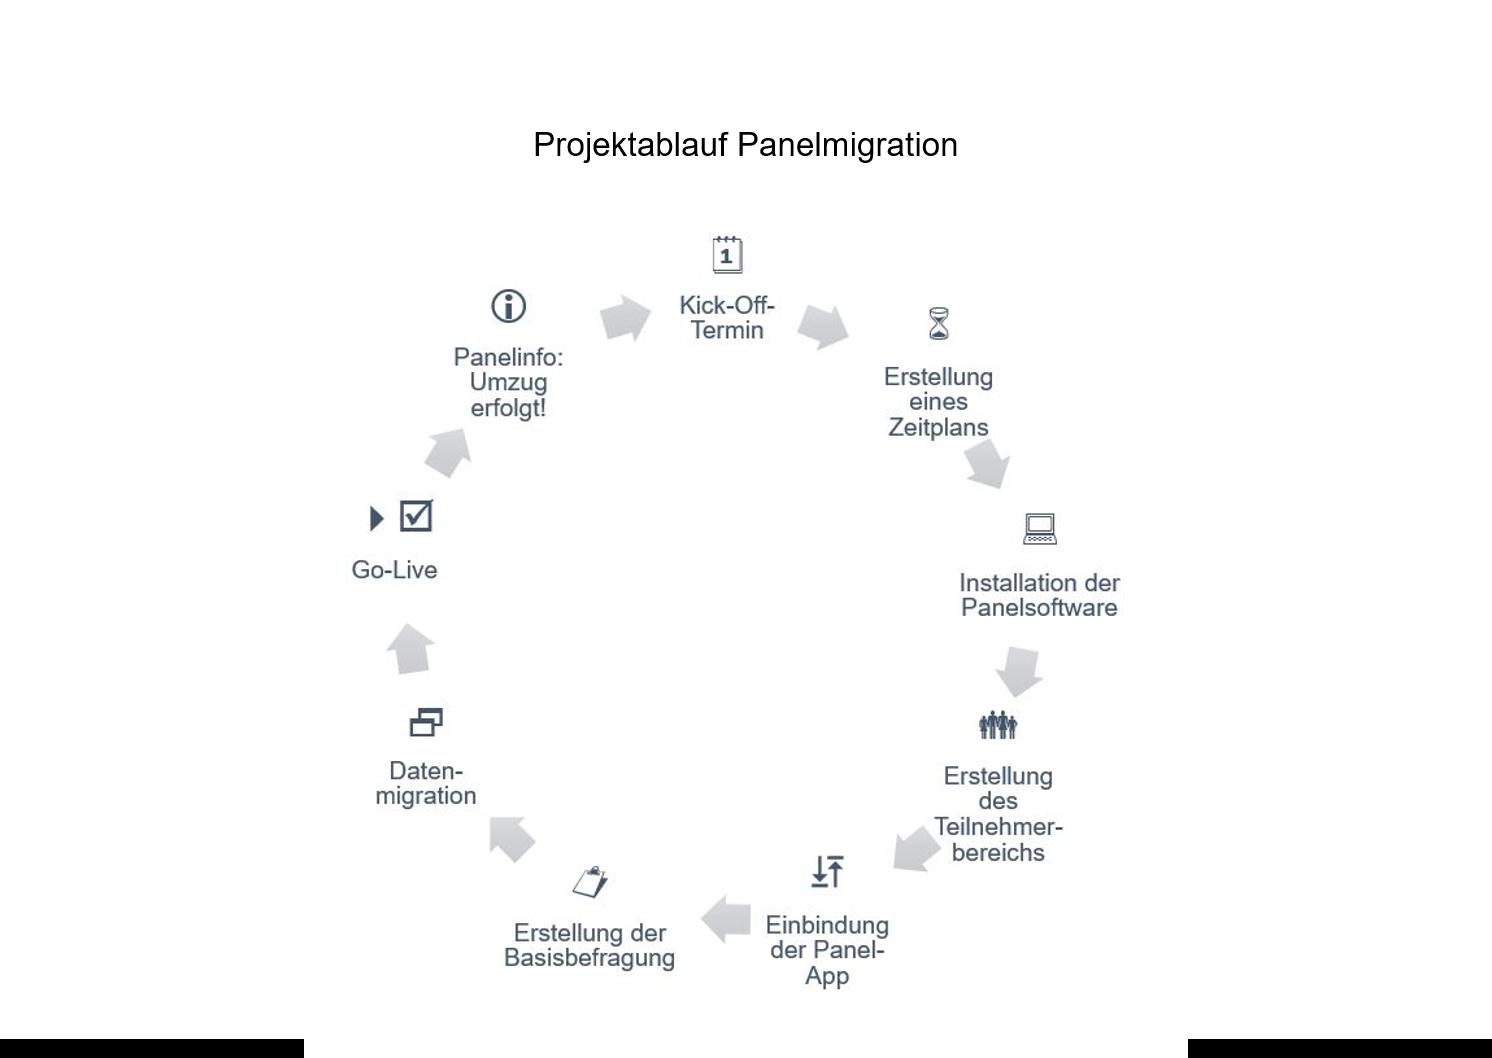 Projektablauf Panelmigration